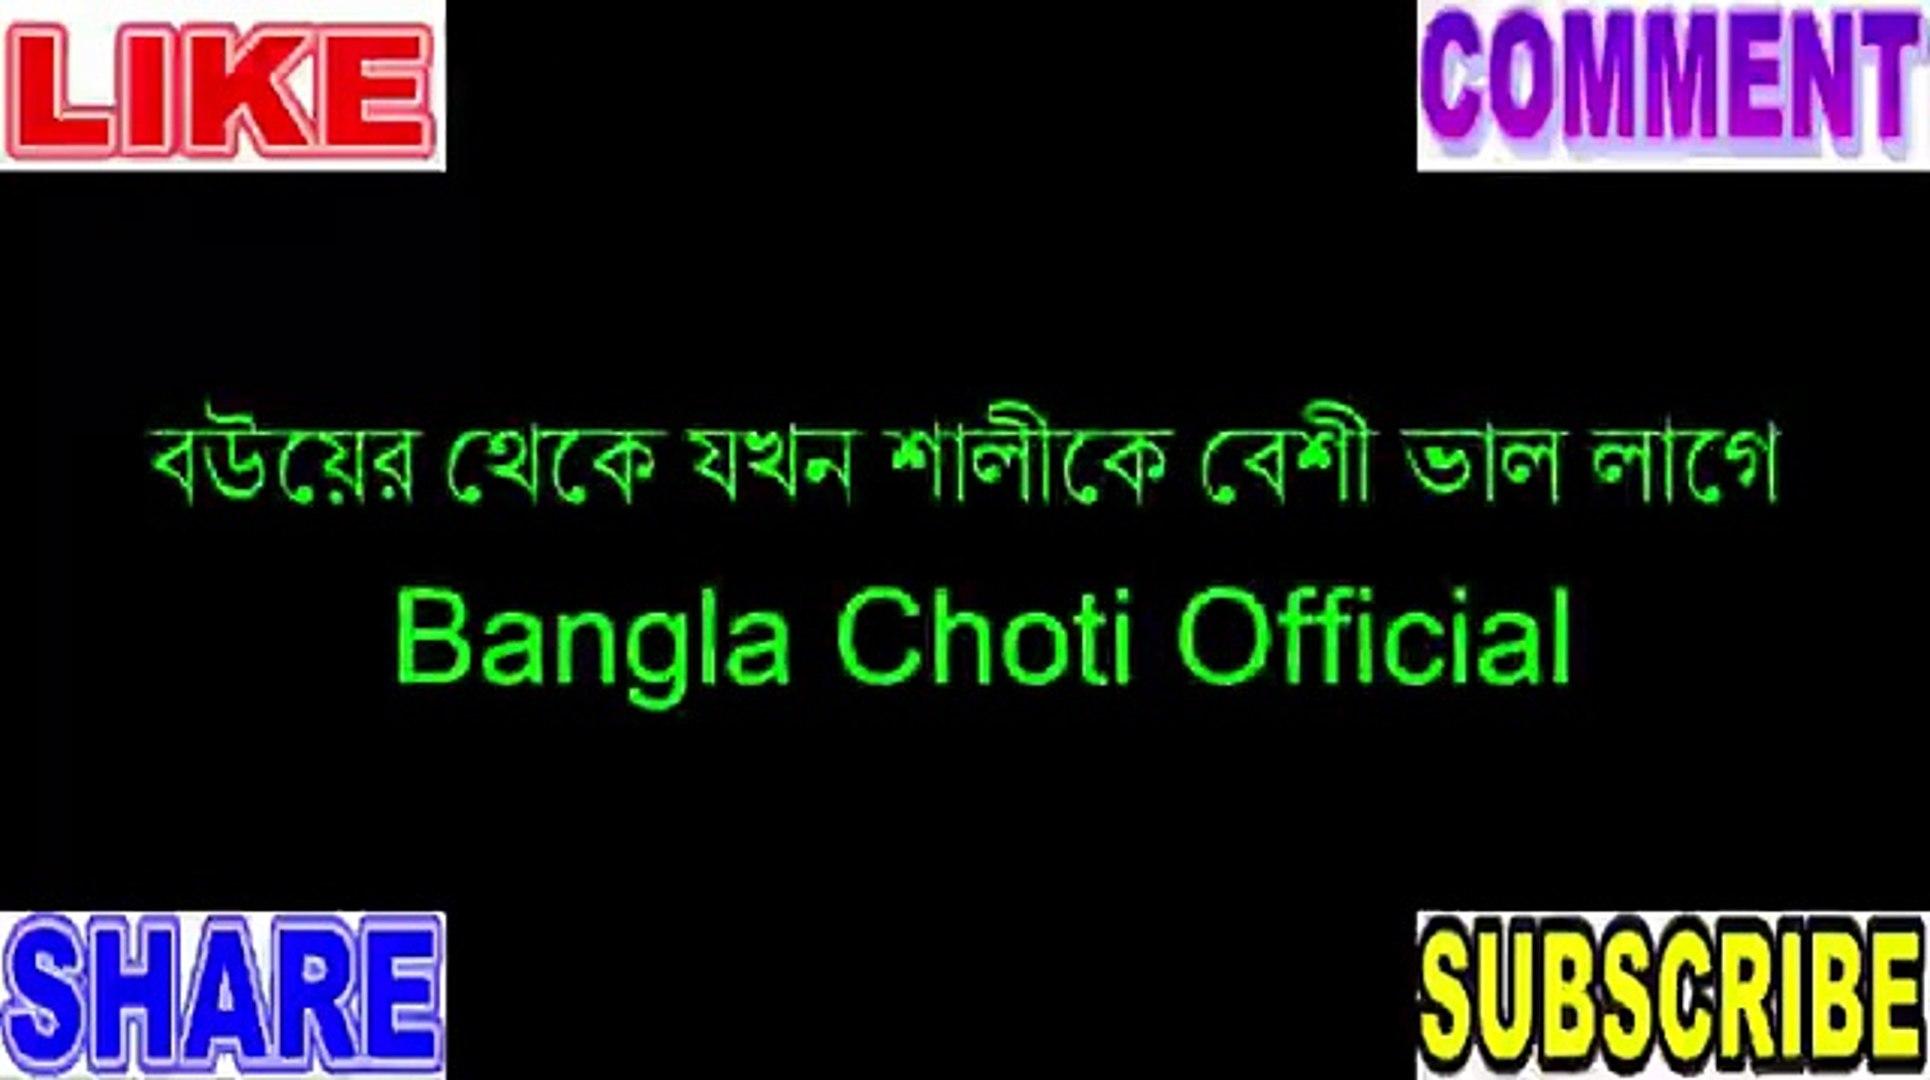 Bangla Choti শালী আমার দ্বিতীয় বউ - bangla choti official